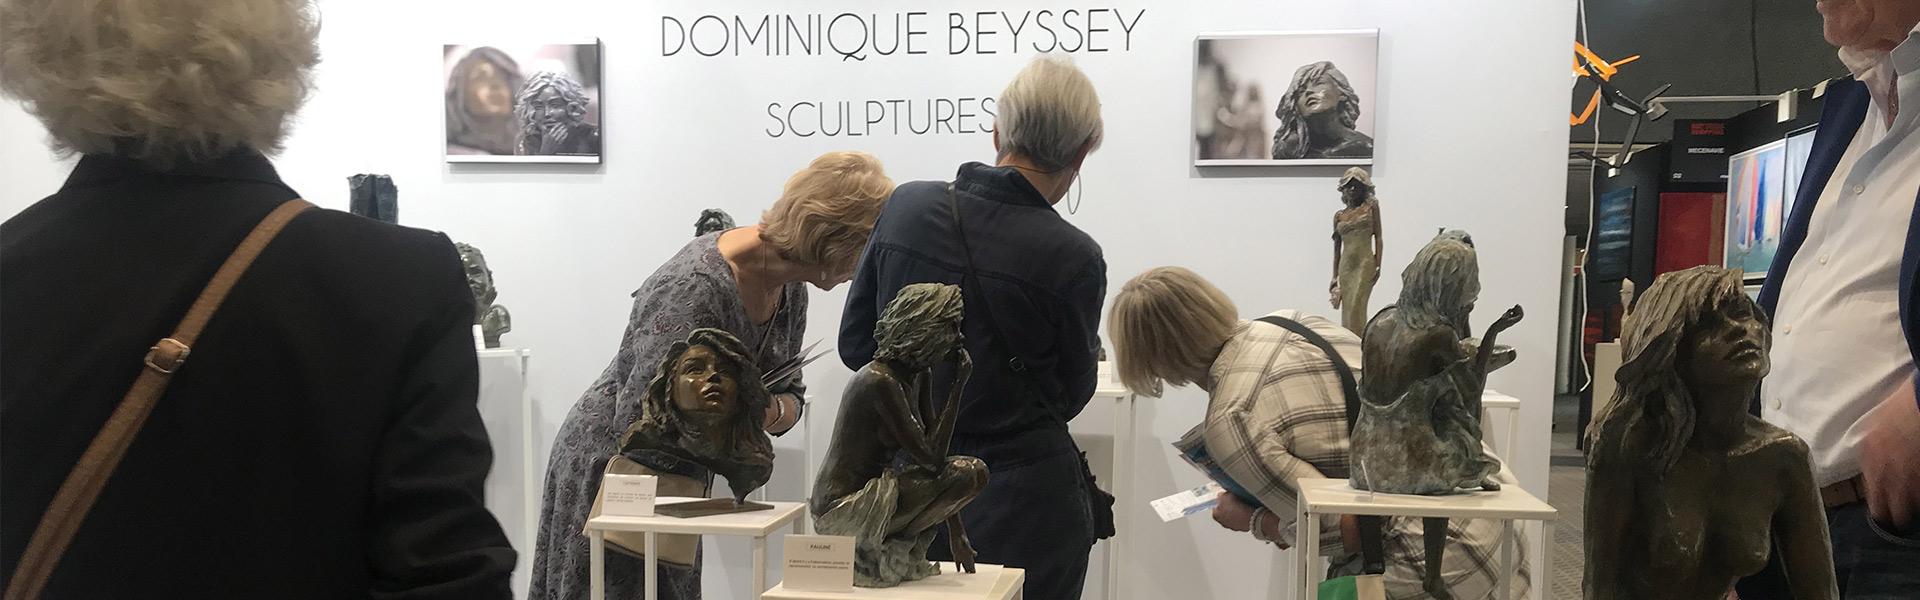 dominique_beyssey_slide1-1